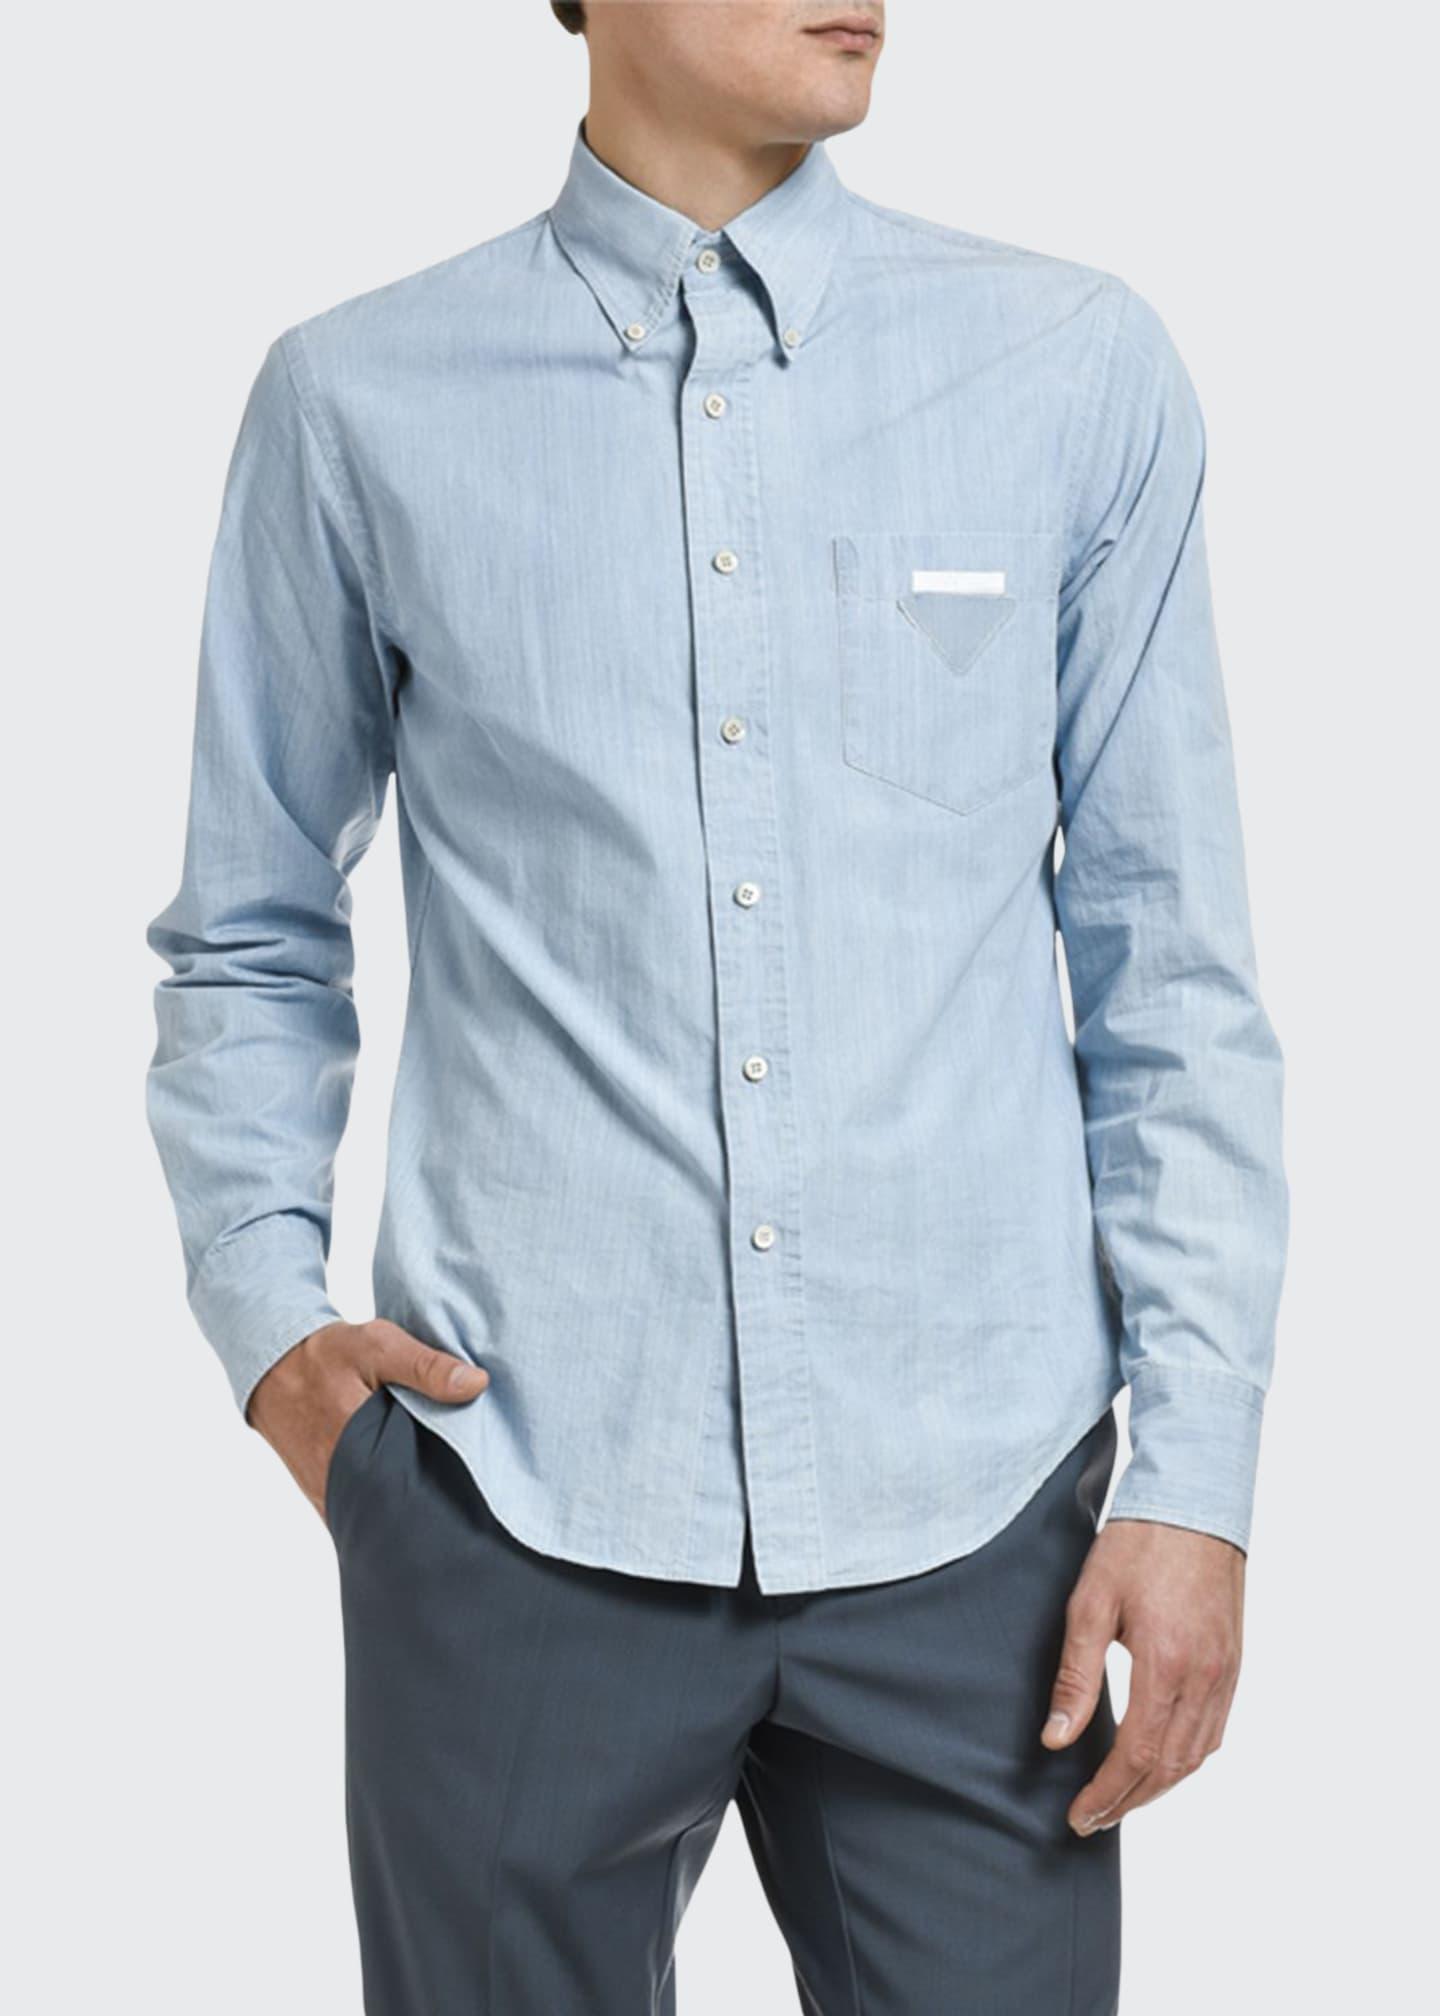 Prada Men's Bleached Chambray Point-Collar Sport Shirt